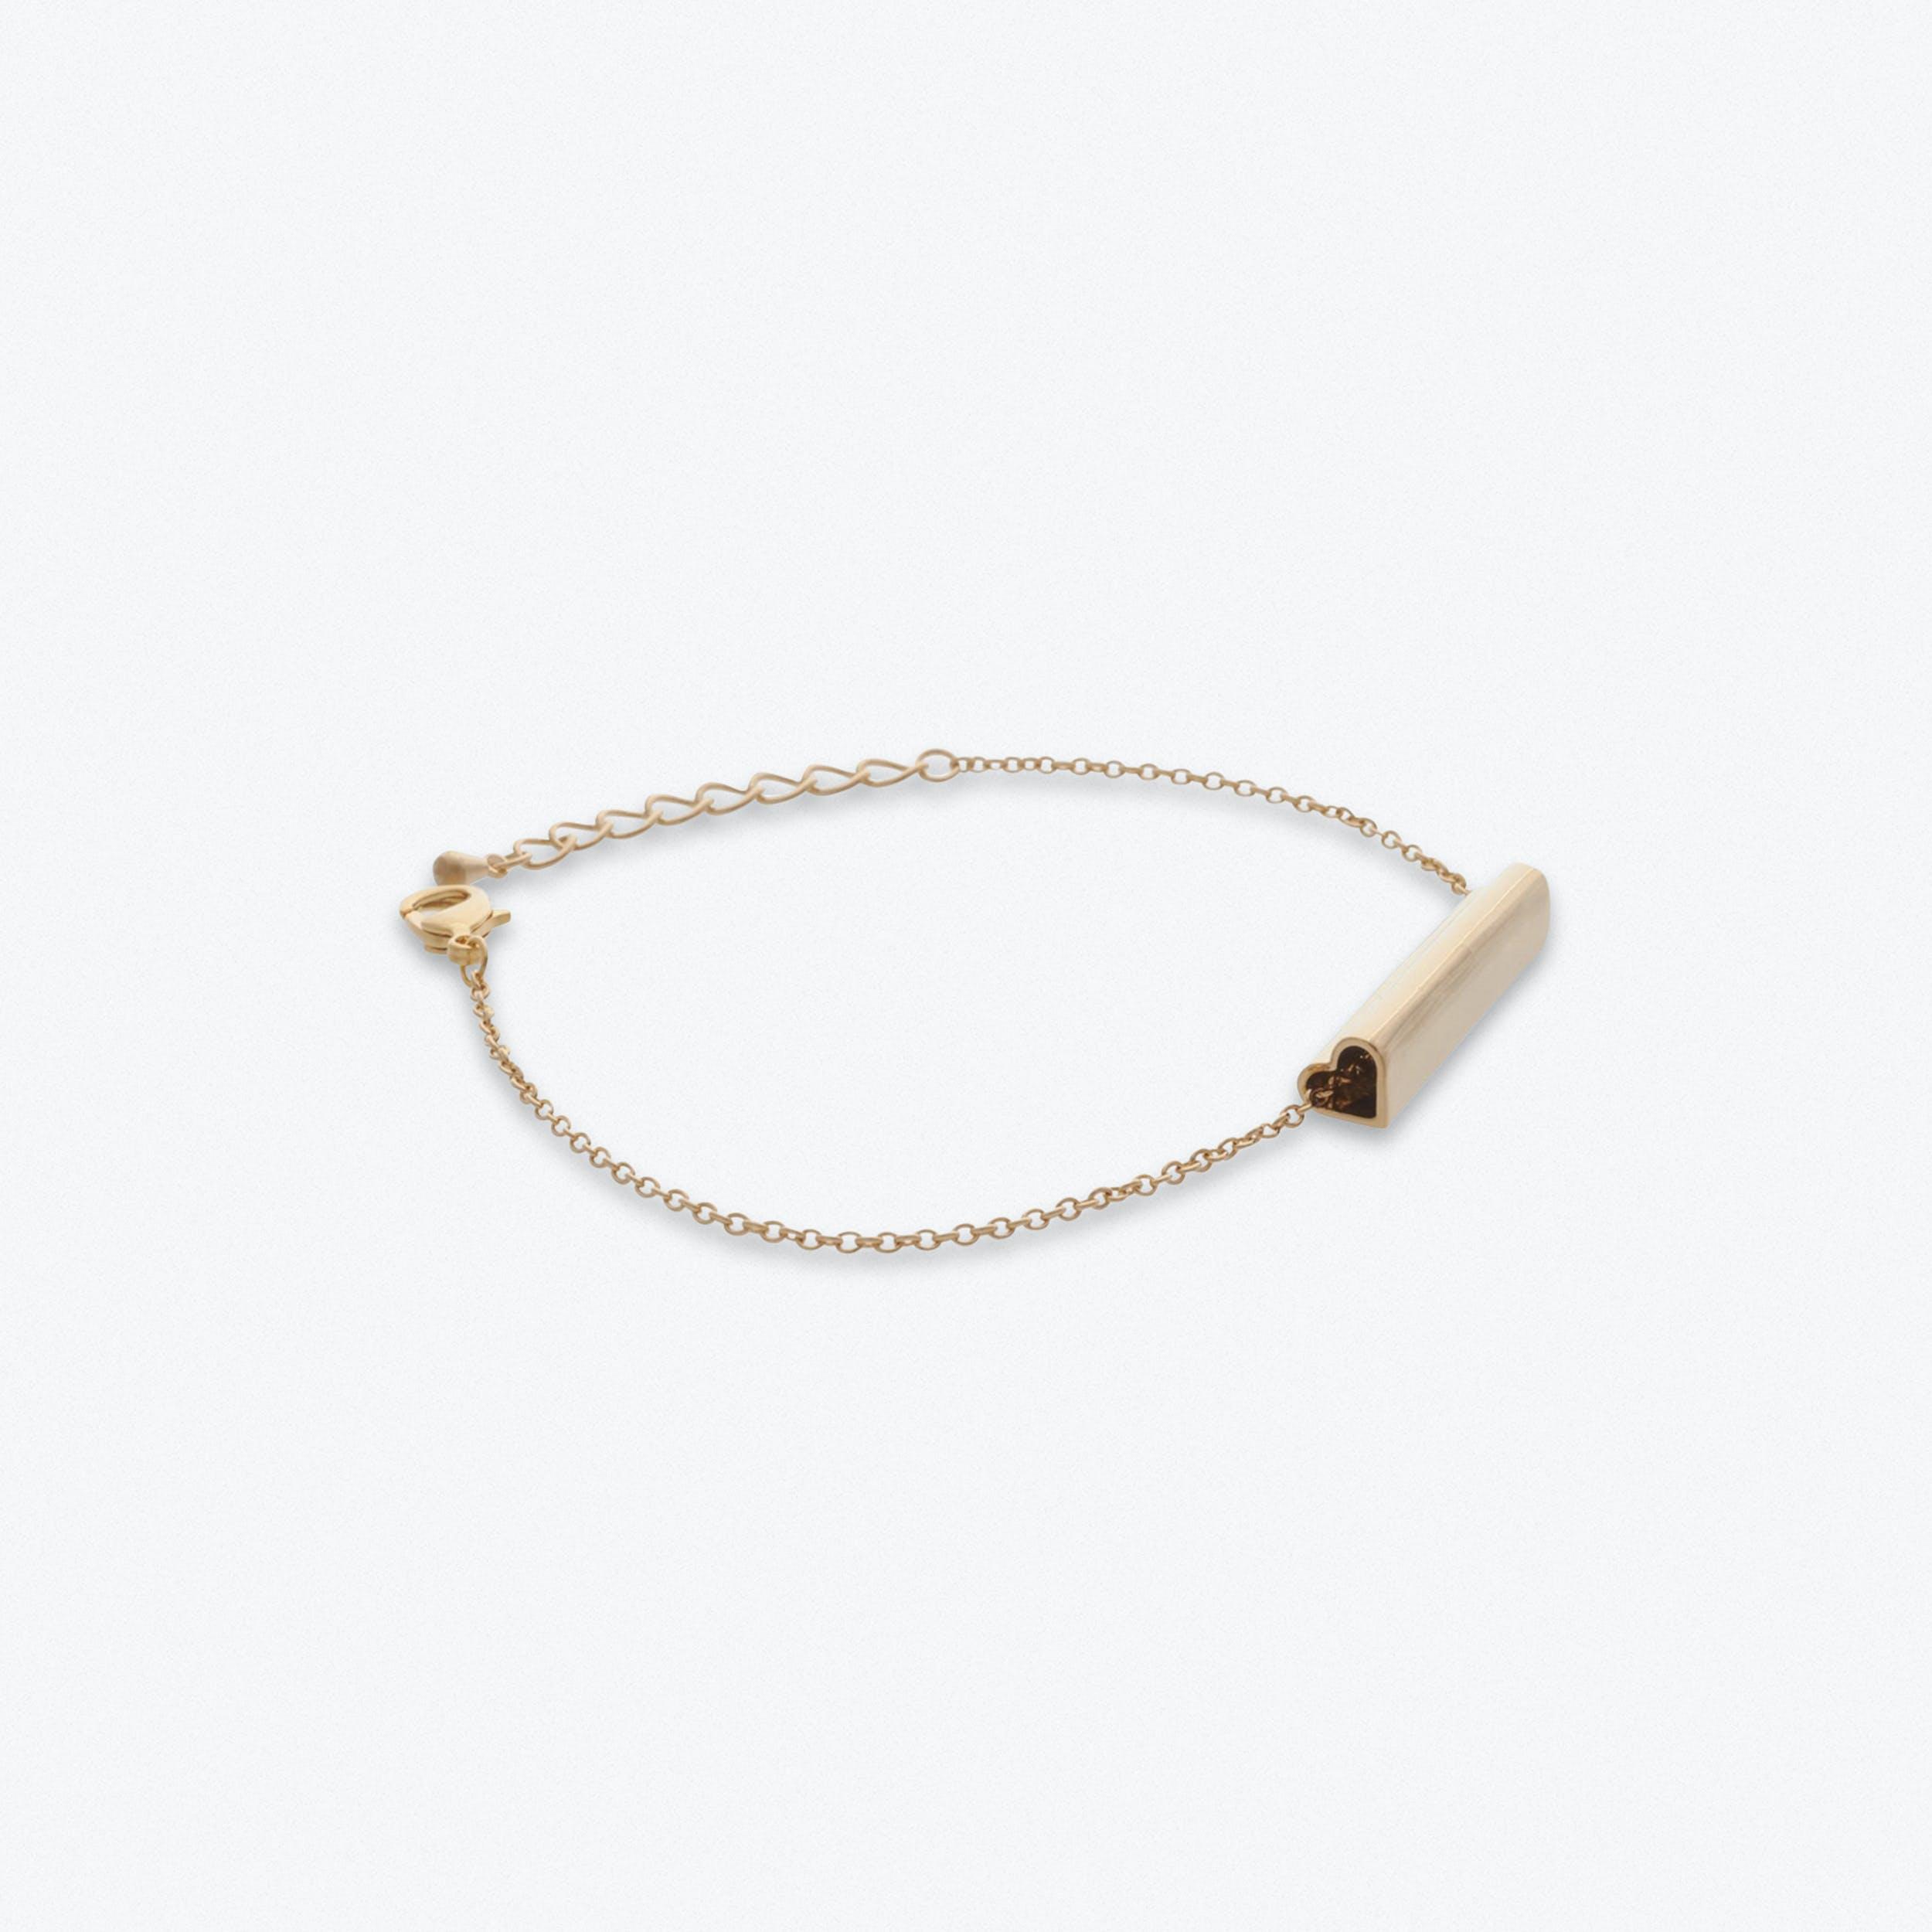 Heart Bar Bracelet in Gold